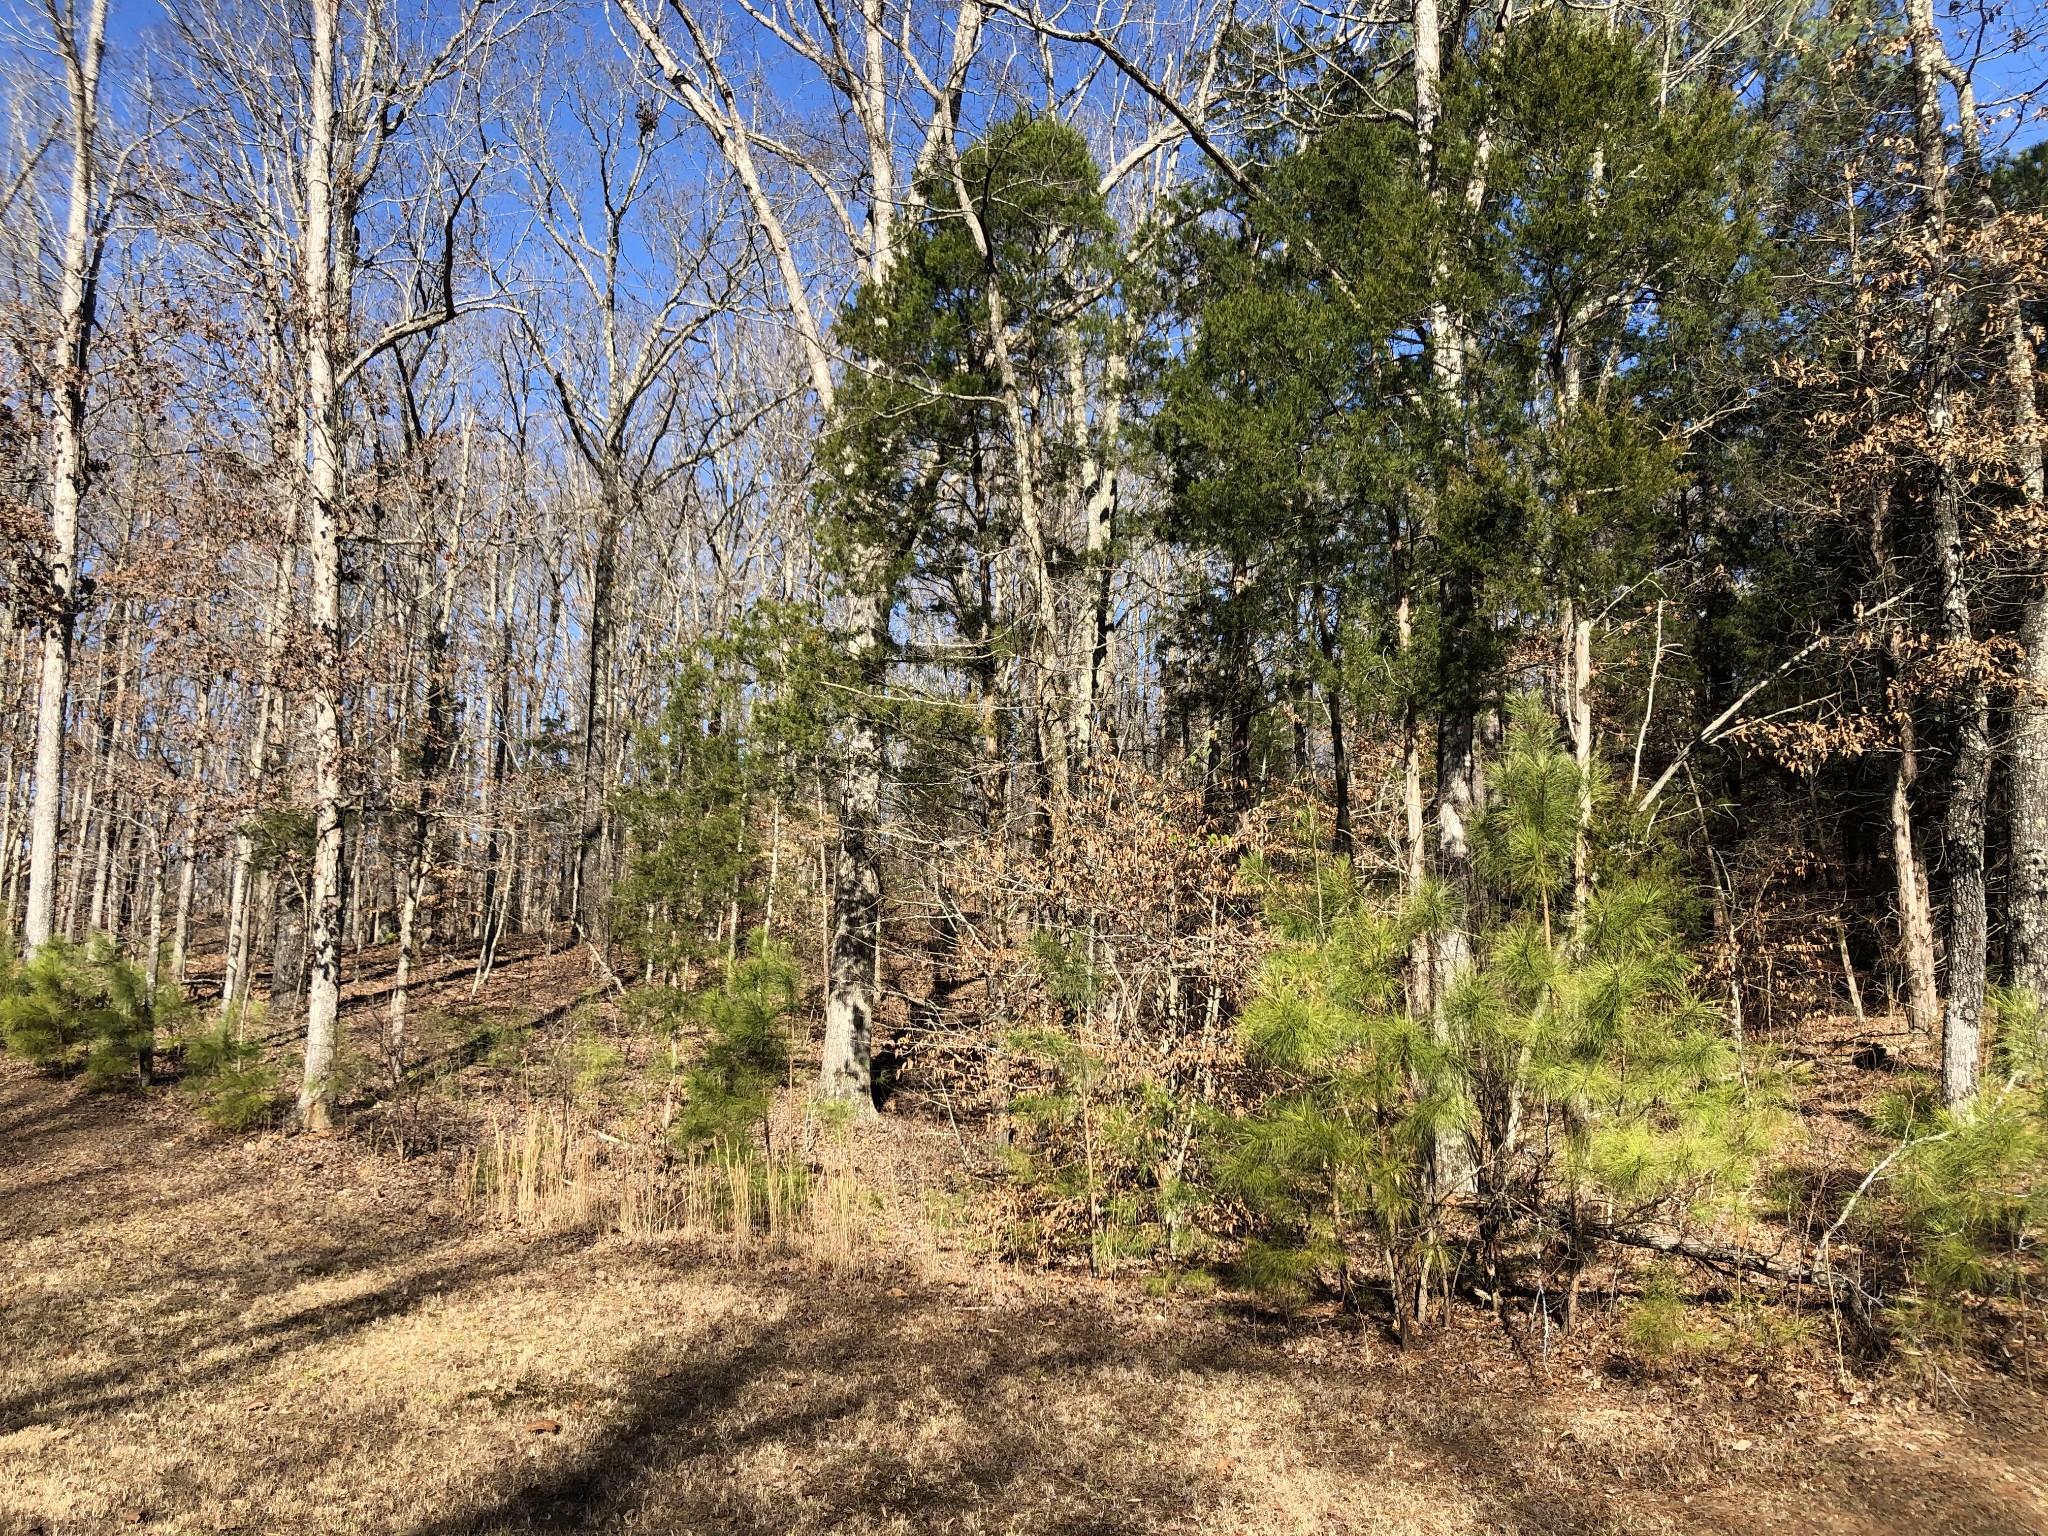 991 Strike King DR, Cedar Grove, TN 38321 - Cedar Grove, TN real estate listing